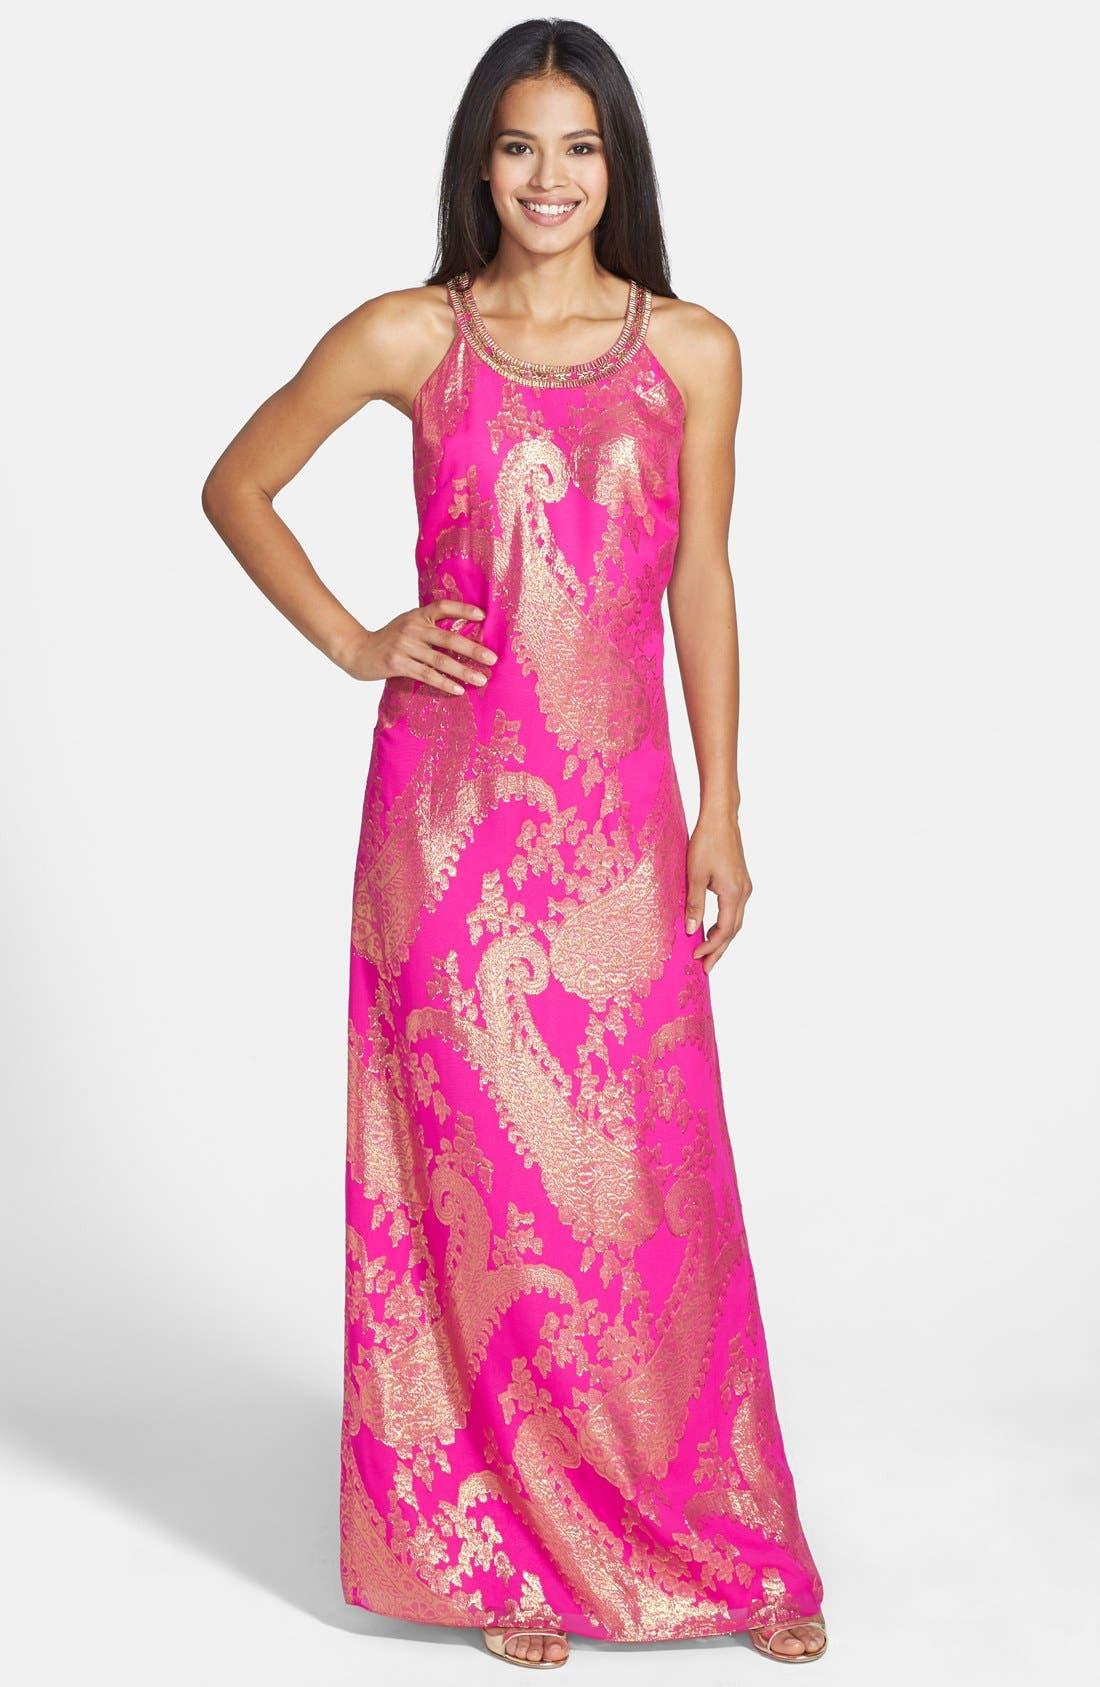 Alternate Image 1 Selected - Lilly Pulitzer® 'Franconia' Beaded Neck Metallic Jacquard Maxi Dress